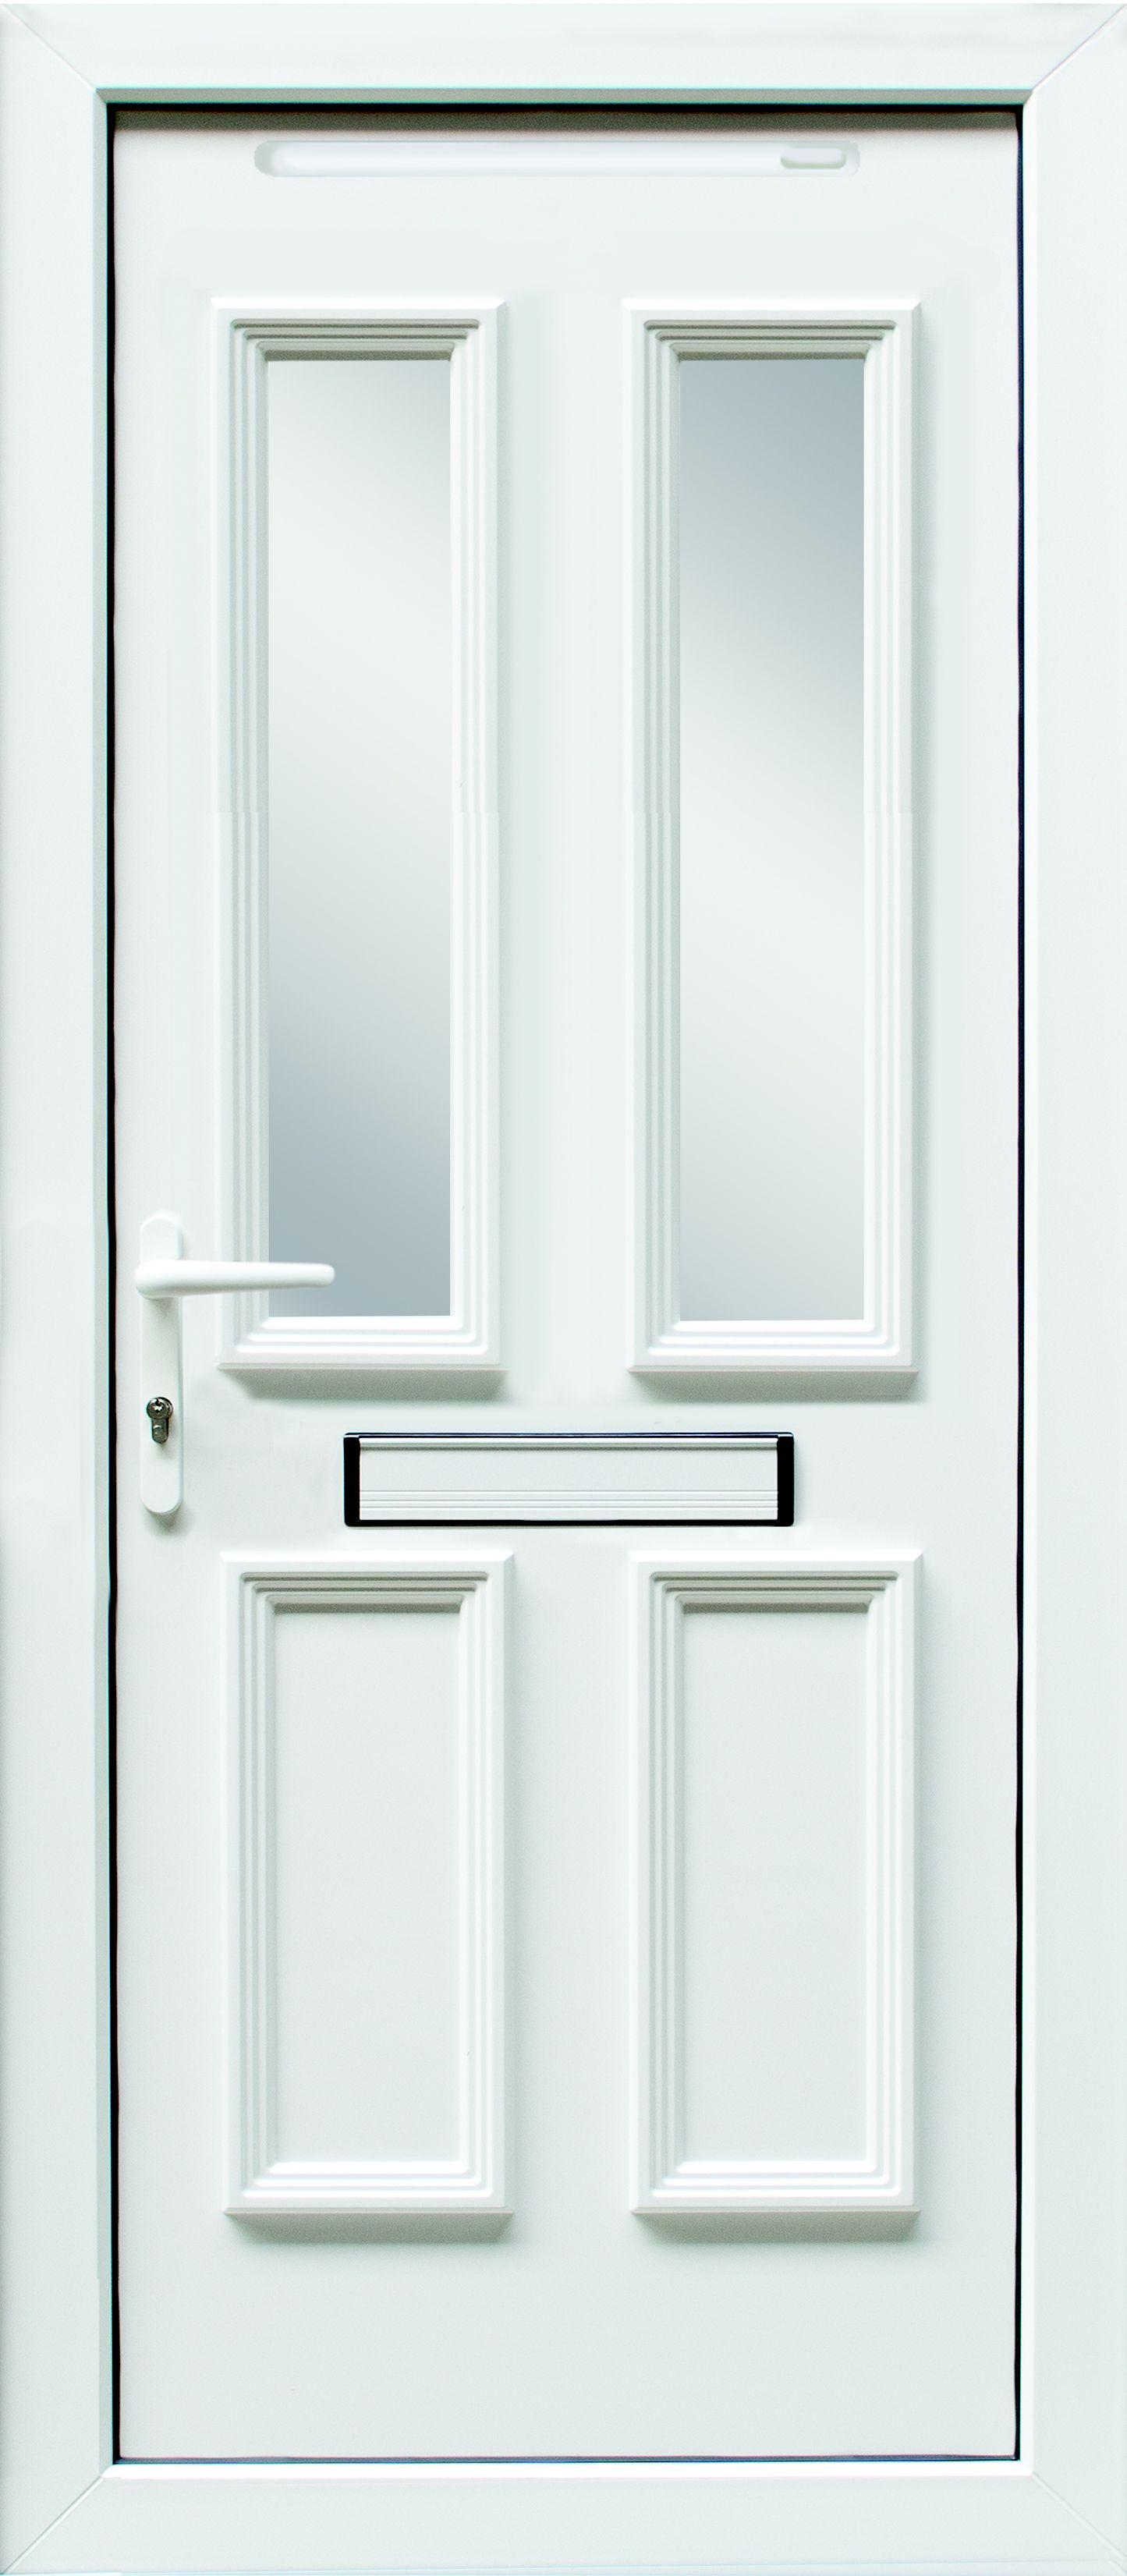 4 Panel PVCu Glazed External Front Door \u0026 Frame Rh (H)2055mm (W)840mm | Departments | DIY at B\u0026Q  sc 1 st  B\u0026Q & 4 Panel PVCu Glazed External Front Door \u0026 Frame Rh (H)2055mm (W ...